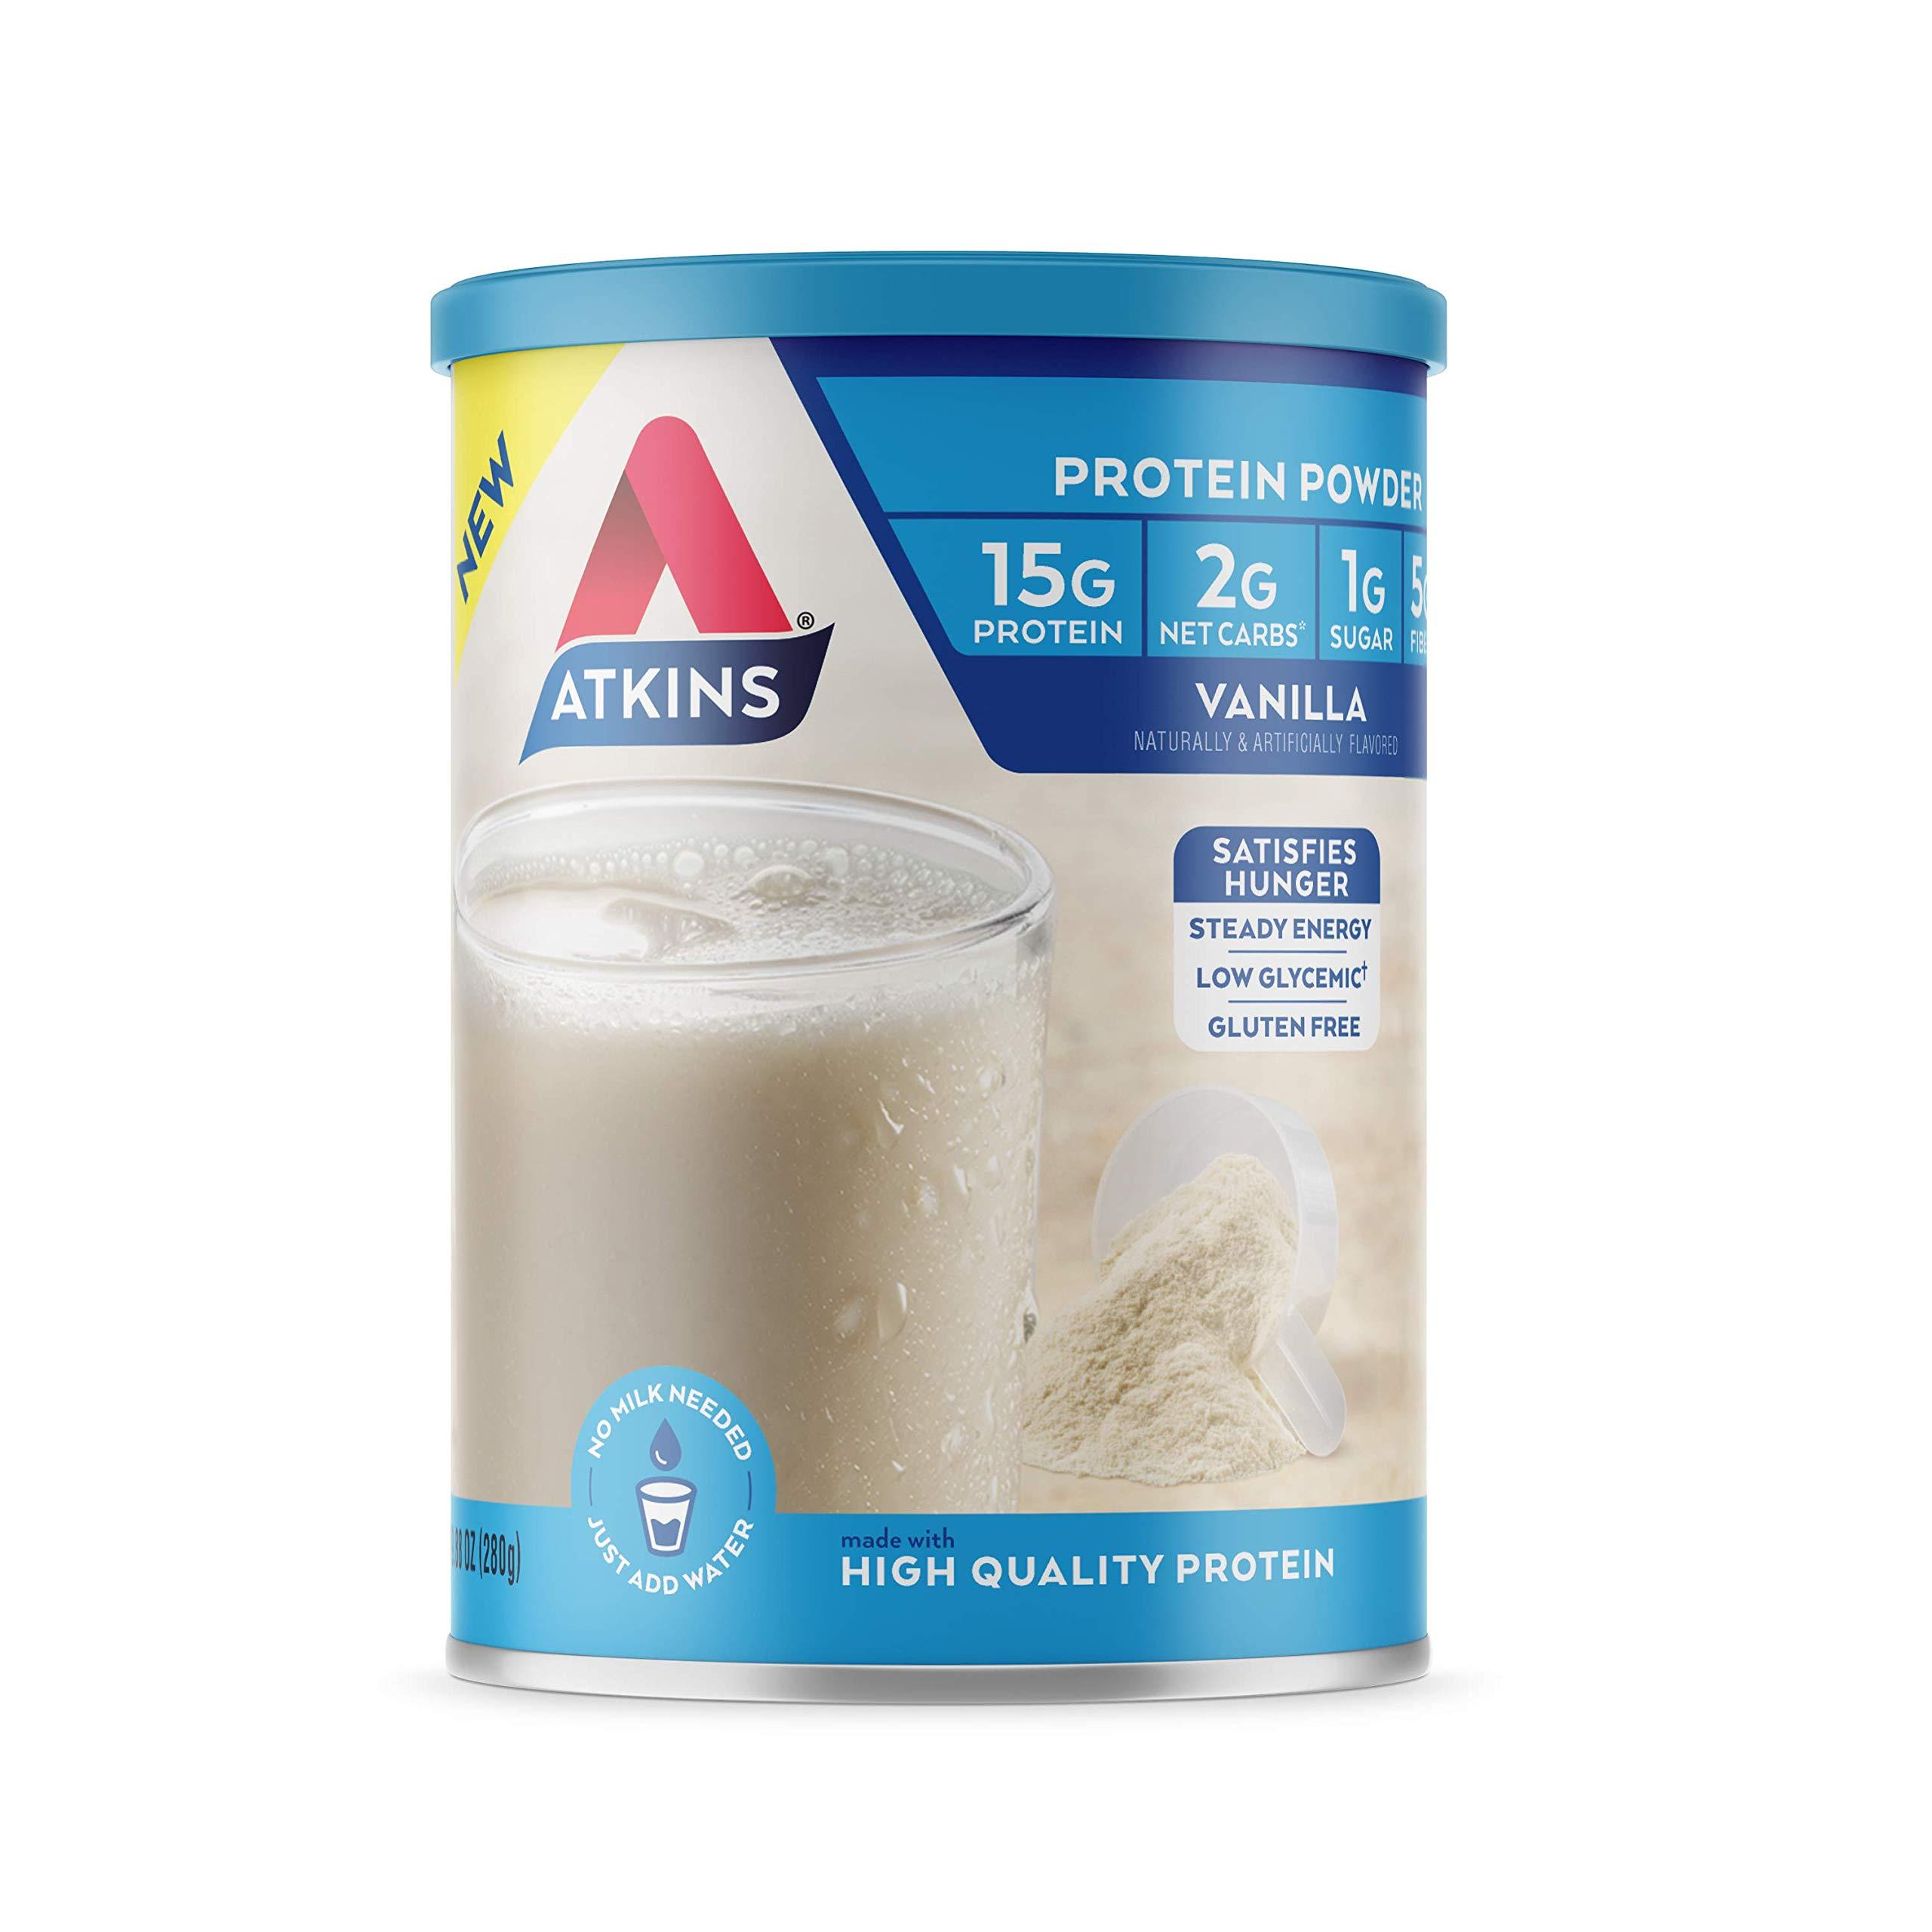 Atkins Gluten Free Protein Powder, Vanilla, Keto Friendly, 9.88 oz. by Atkins